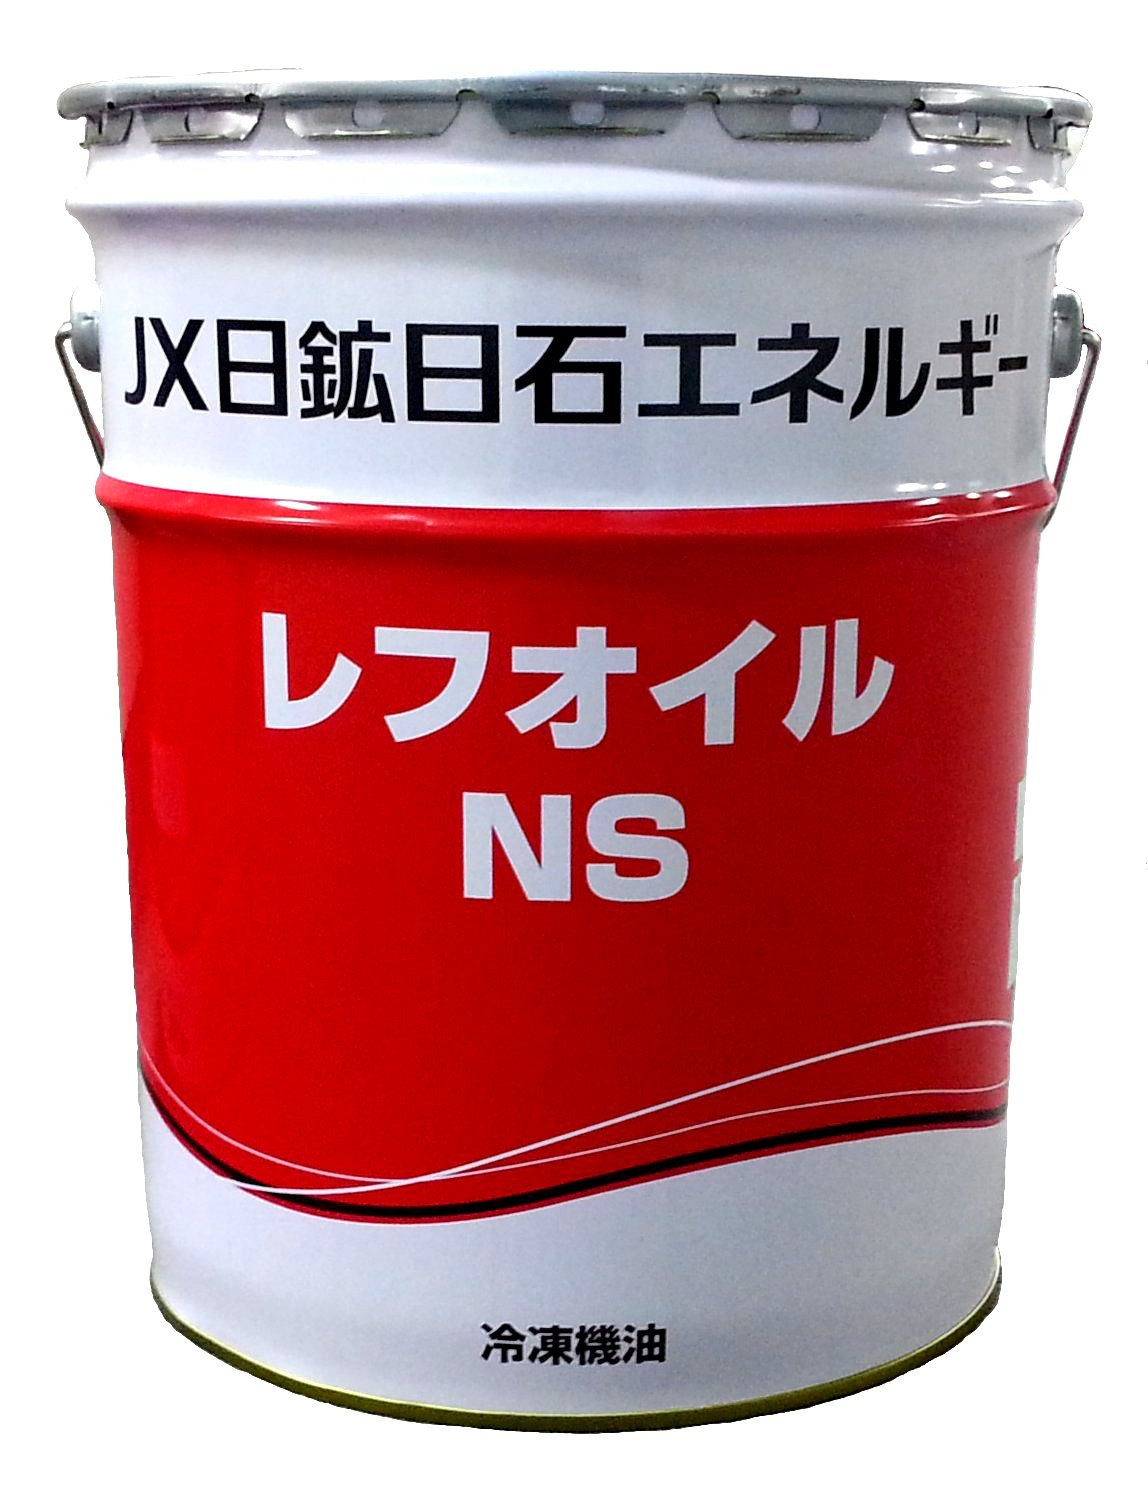 JX日鉱日石 レフオイルNS 4GS   (ナフテン系高級冷凍機油) 20Lペール缶 B00BG48CL8